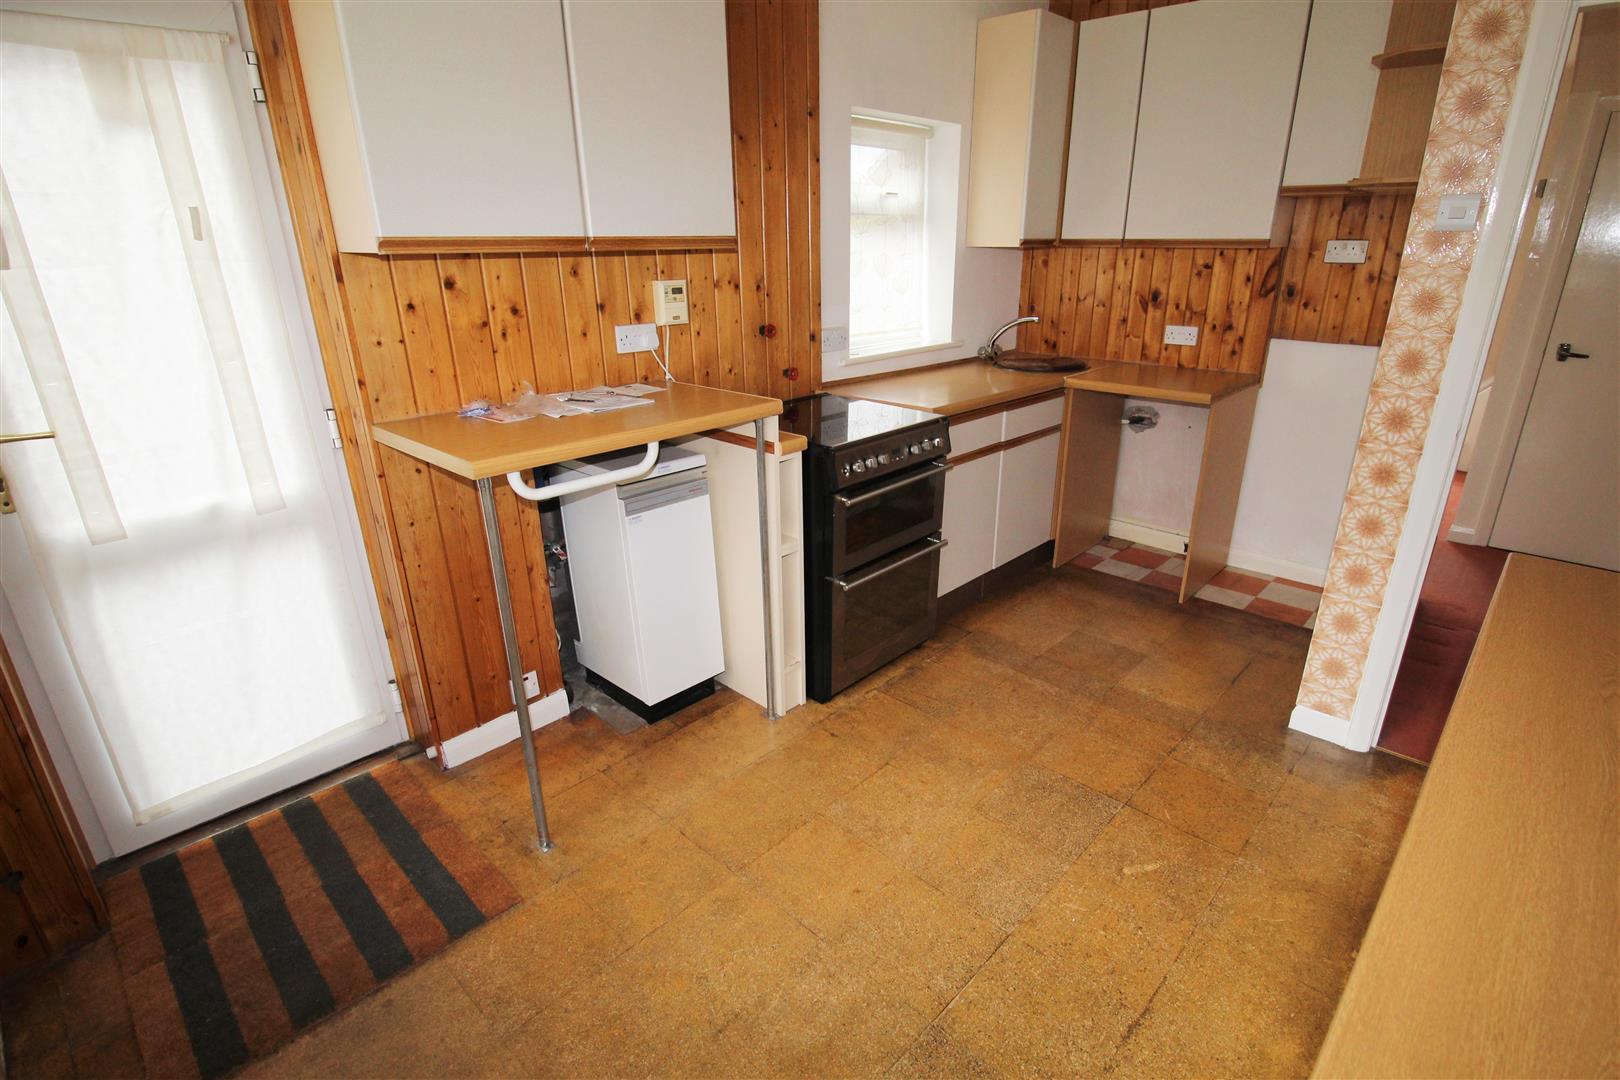 3 Bedrooms, House - Semi-Detached, Brenda Crescent, Thornton, Liverpool